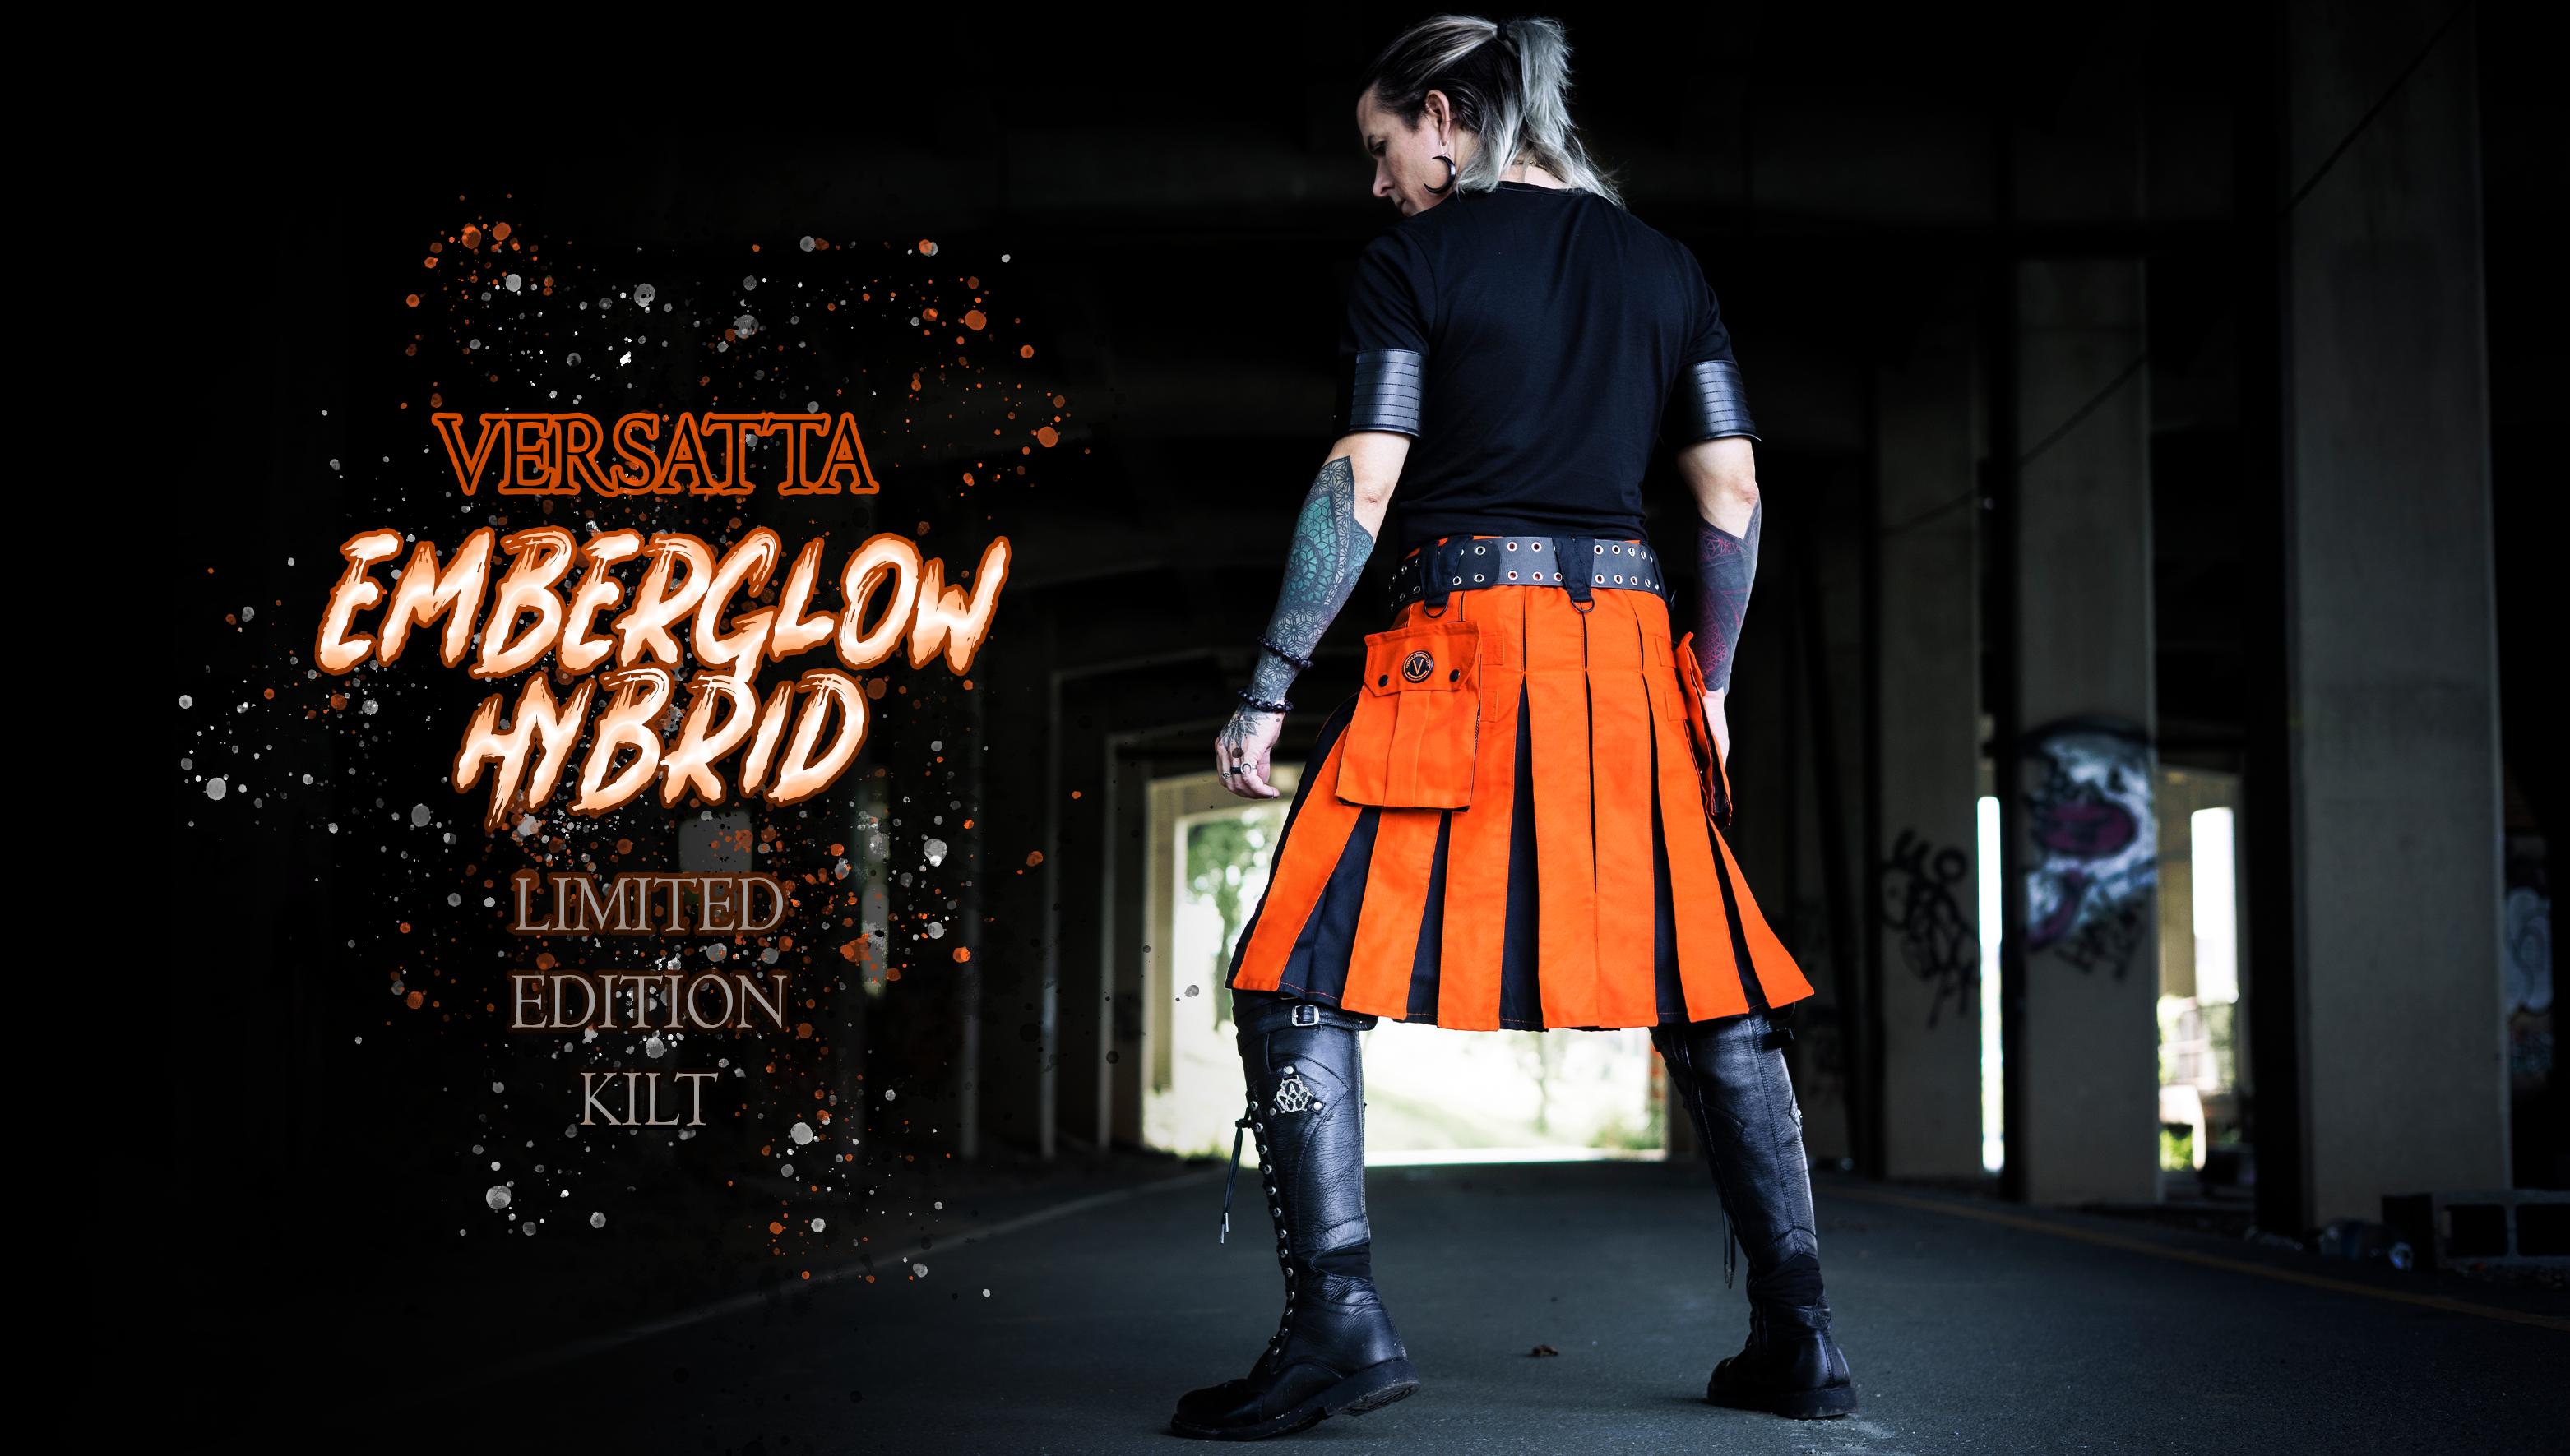 Verillas Versatta Emberglow Hybrid Kilt - Limited Edition Halloween Orange and Black Kilt